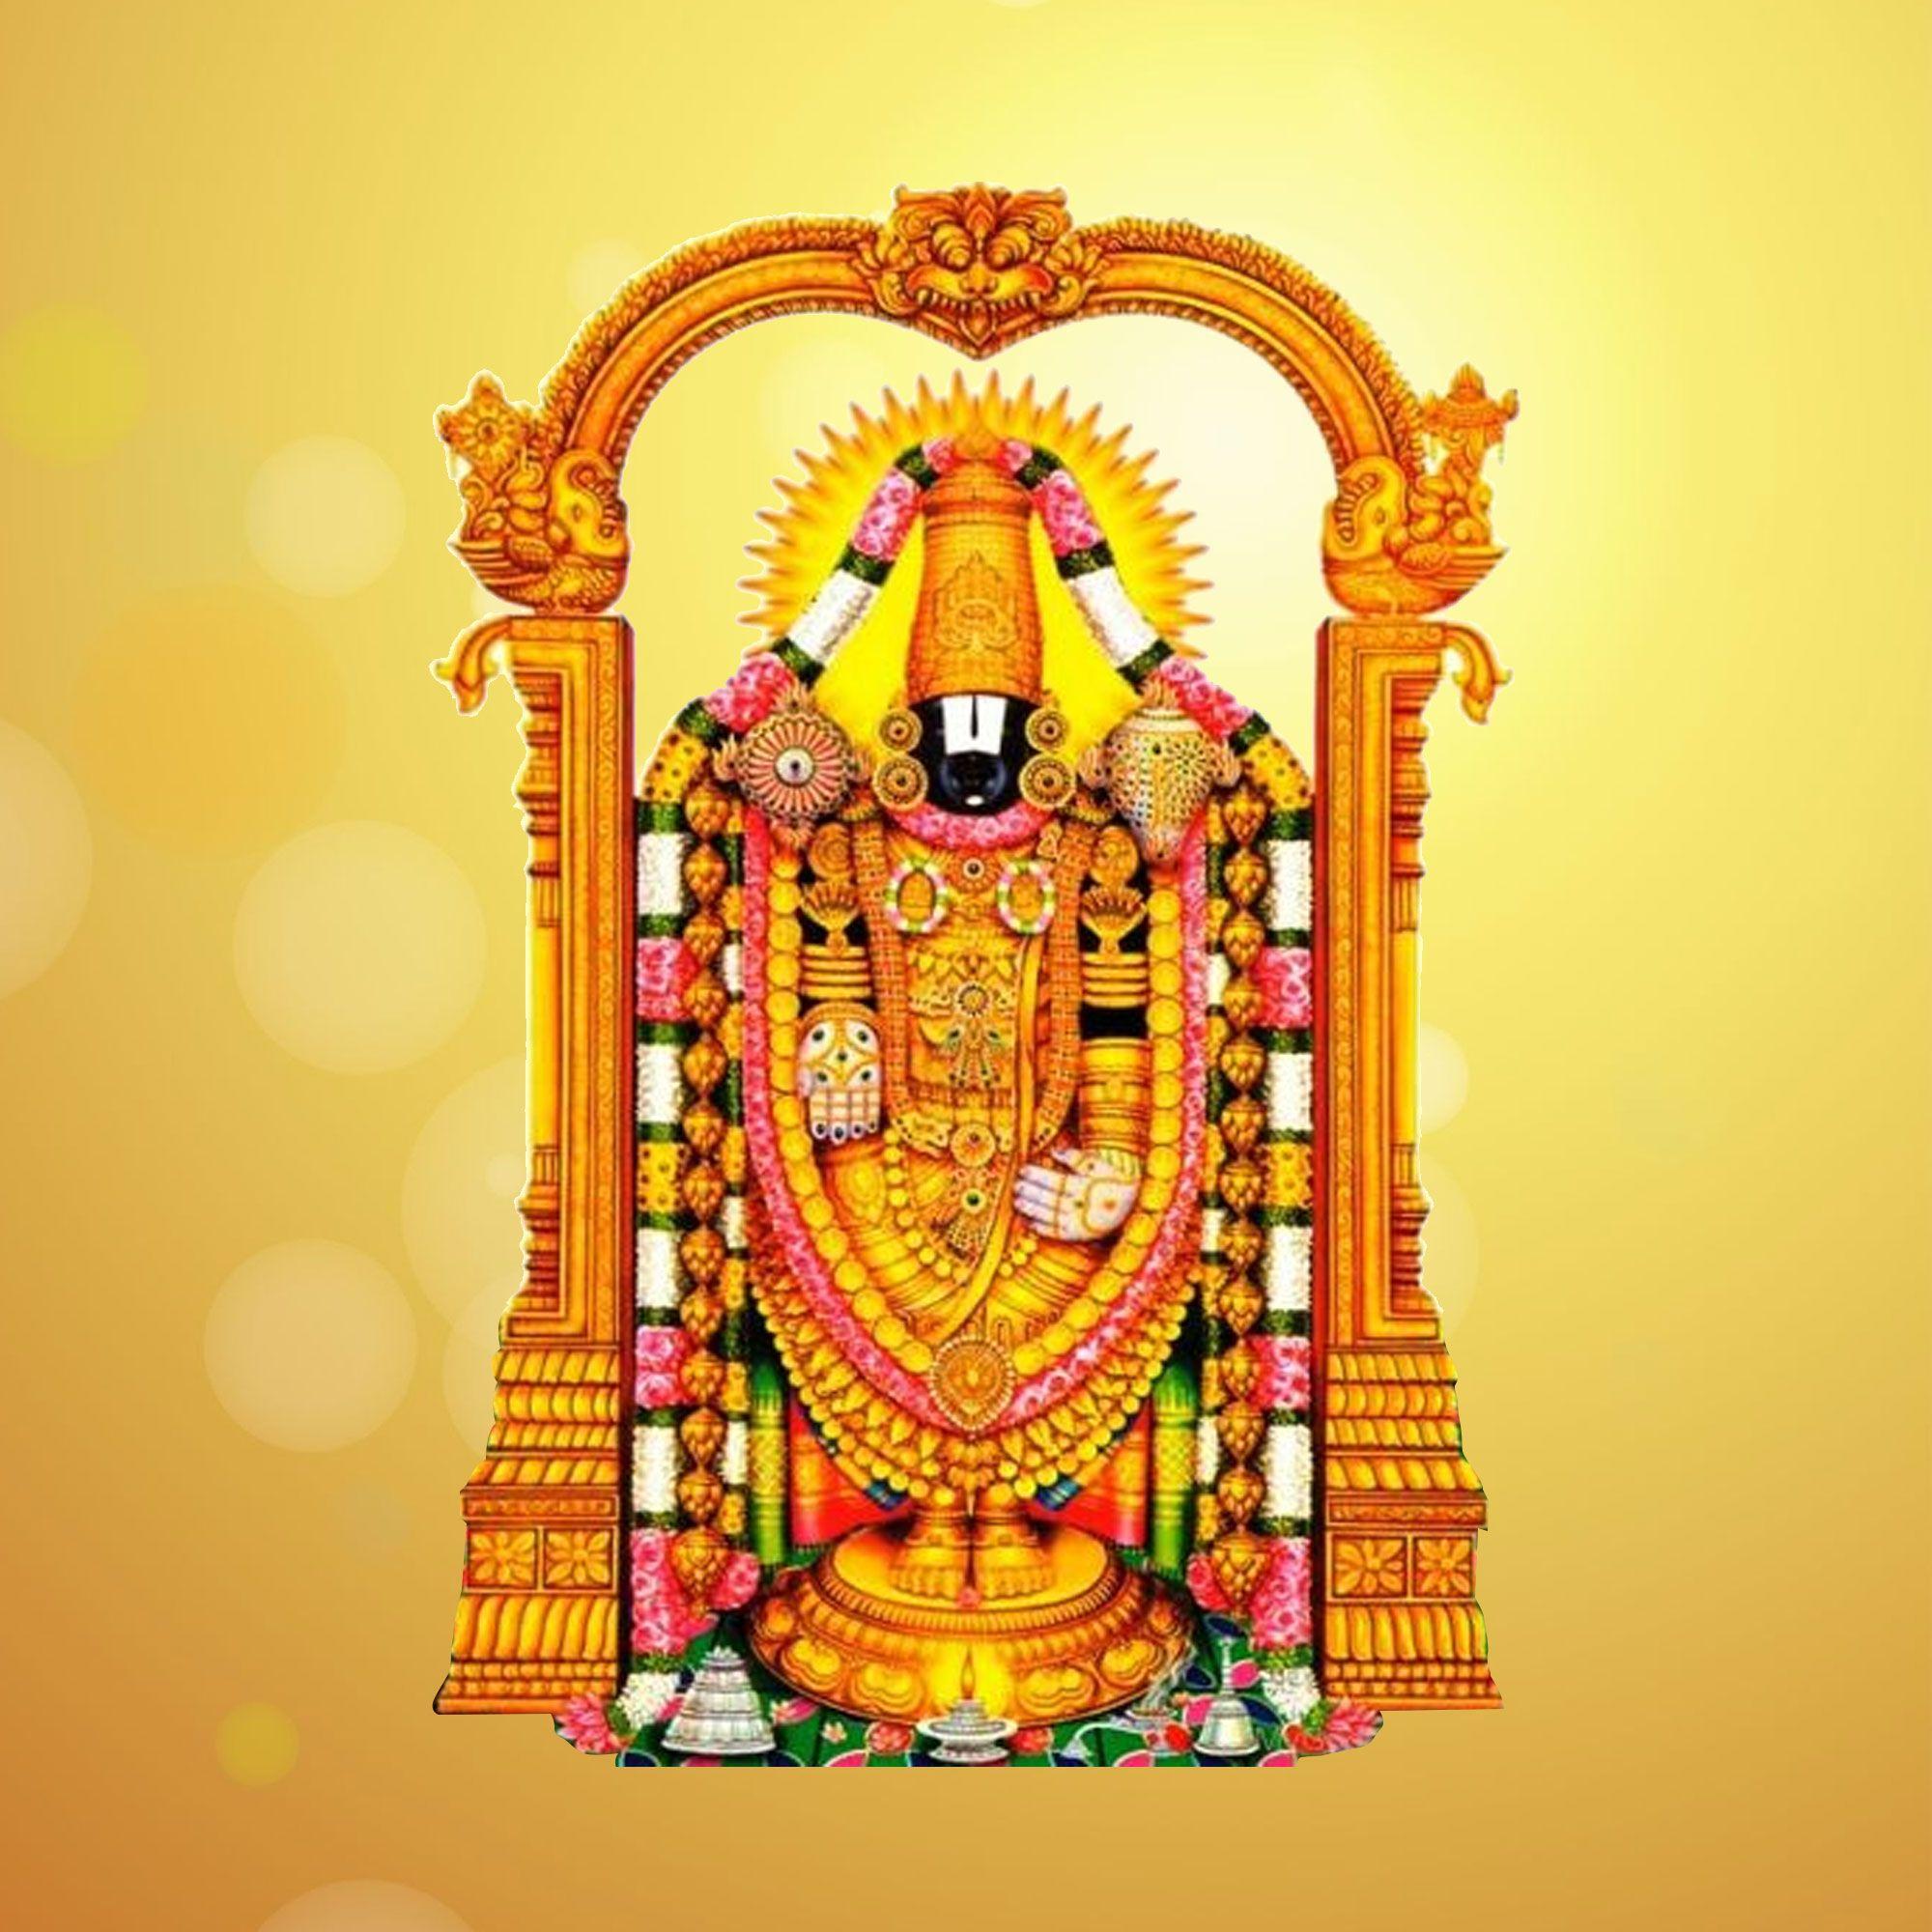 Venkateswara Swamy Images And Hd Wallpaper For Mobile Hd Wallpaper 4k Lord Vishnu Wallpapers Lord Shiva Painting Balaji images hd wallpaper free download